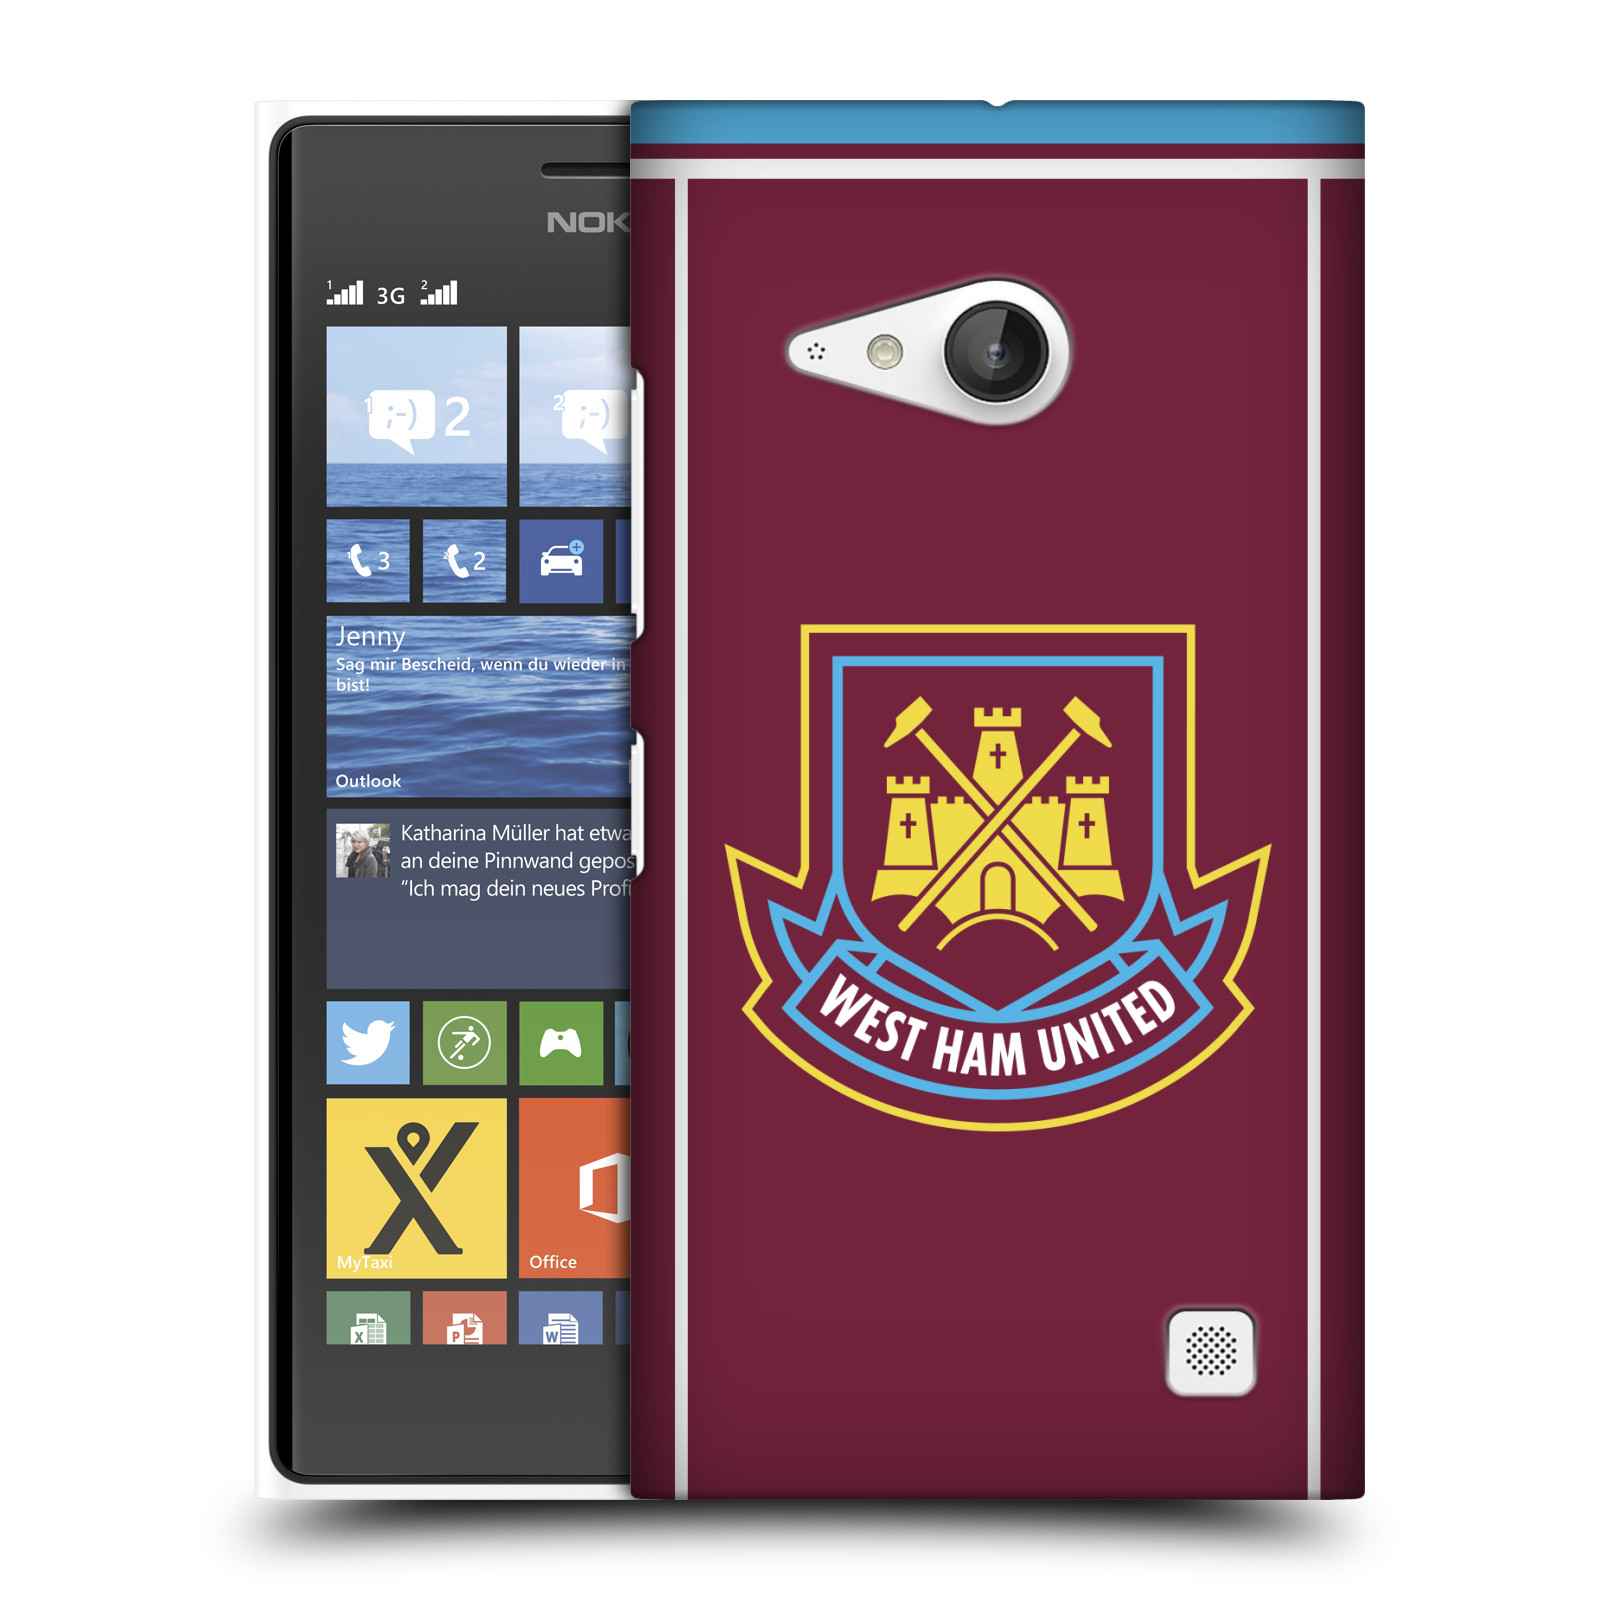 Plastové pouzdro na mobil Nokia Lumia 730 Dual SIM - Head Case - West Ham United - Retro znak (Plastový kryt či obal na mobilní telefon s motivem West Ham United - Kladiváři - Retro znak pro Nokia Lumia 730 Dual SIM)